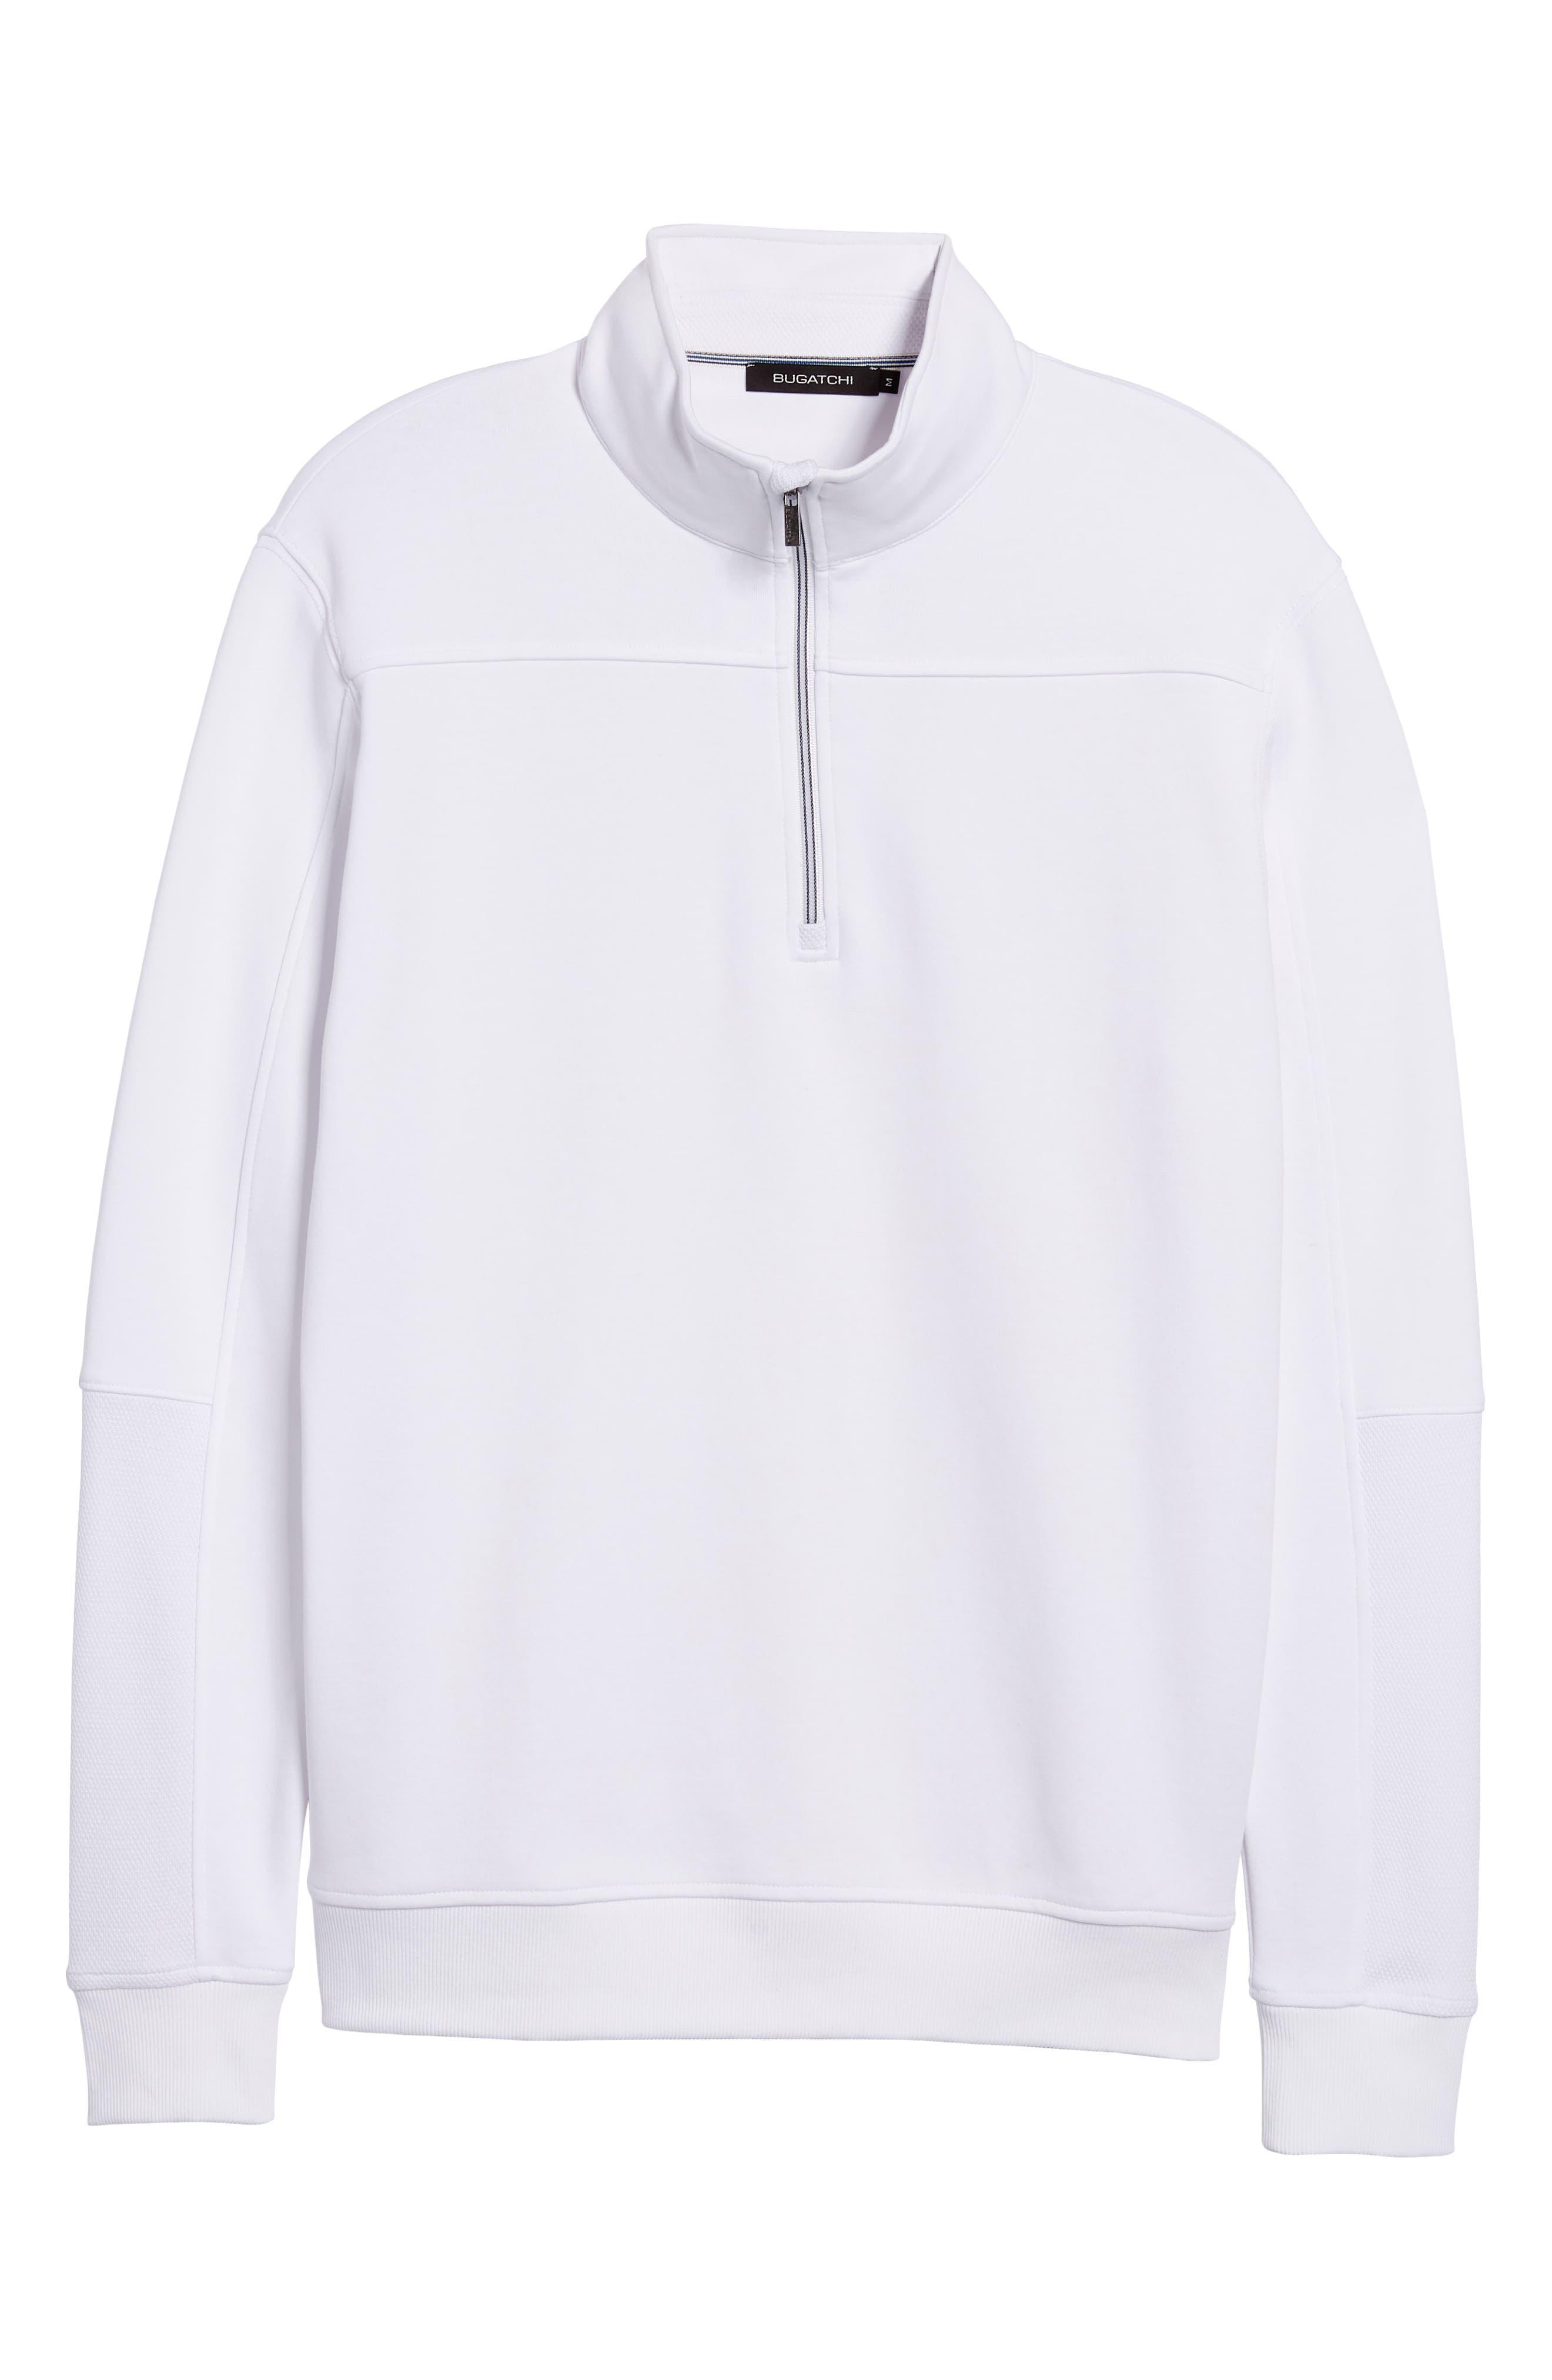 Regular Fit Knit Quarter Zip Pullover,                             Alternate thumbnail 6, color,                             White